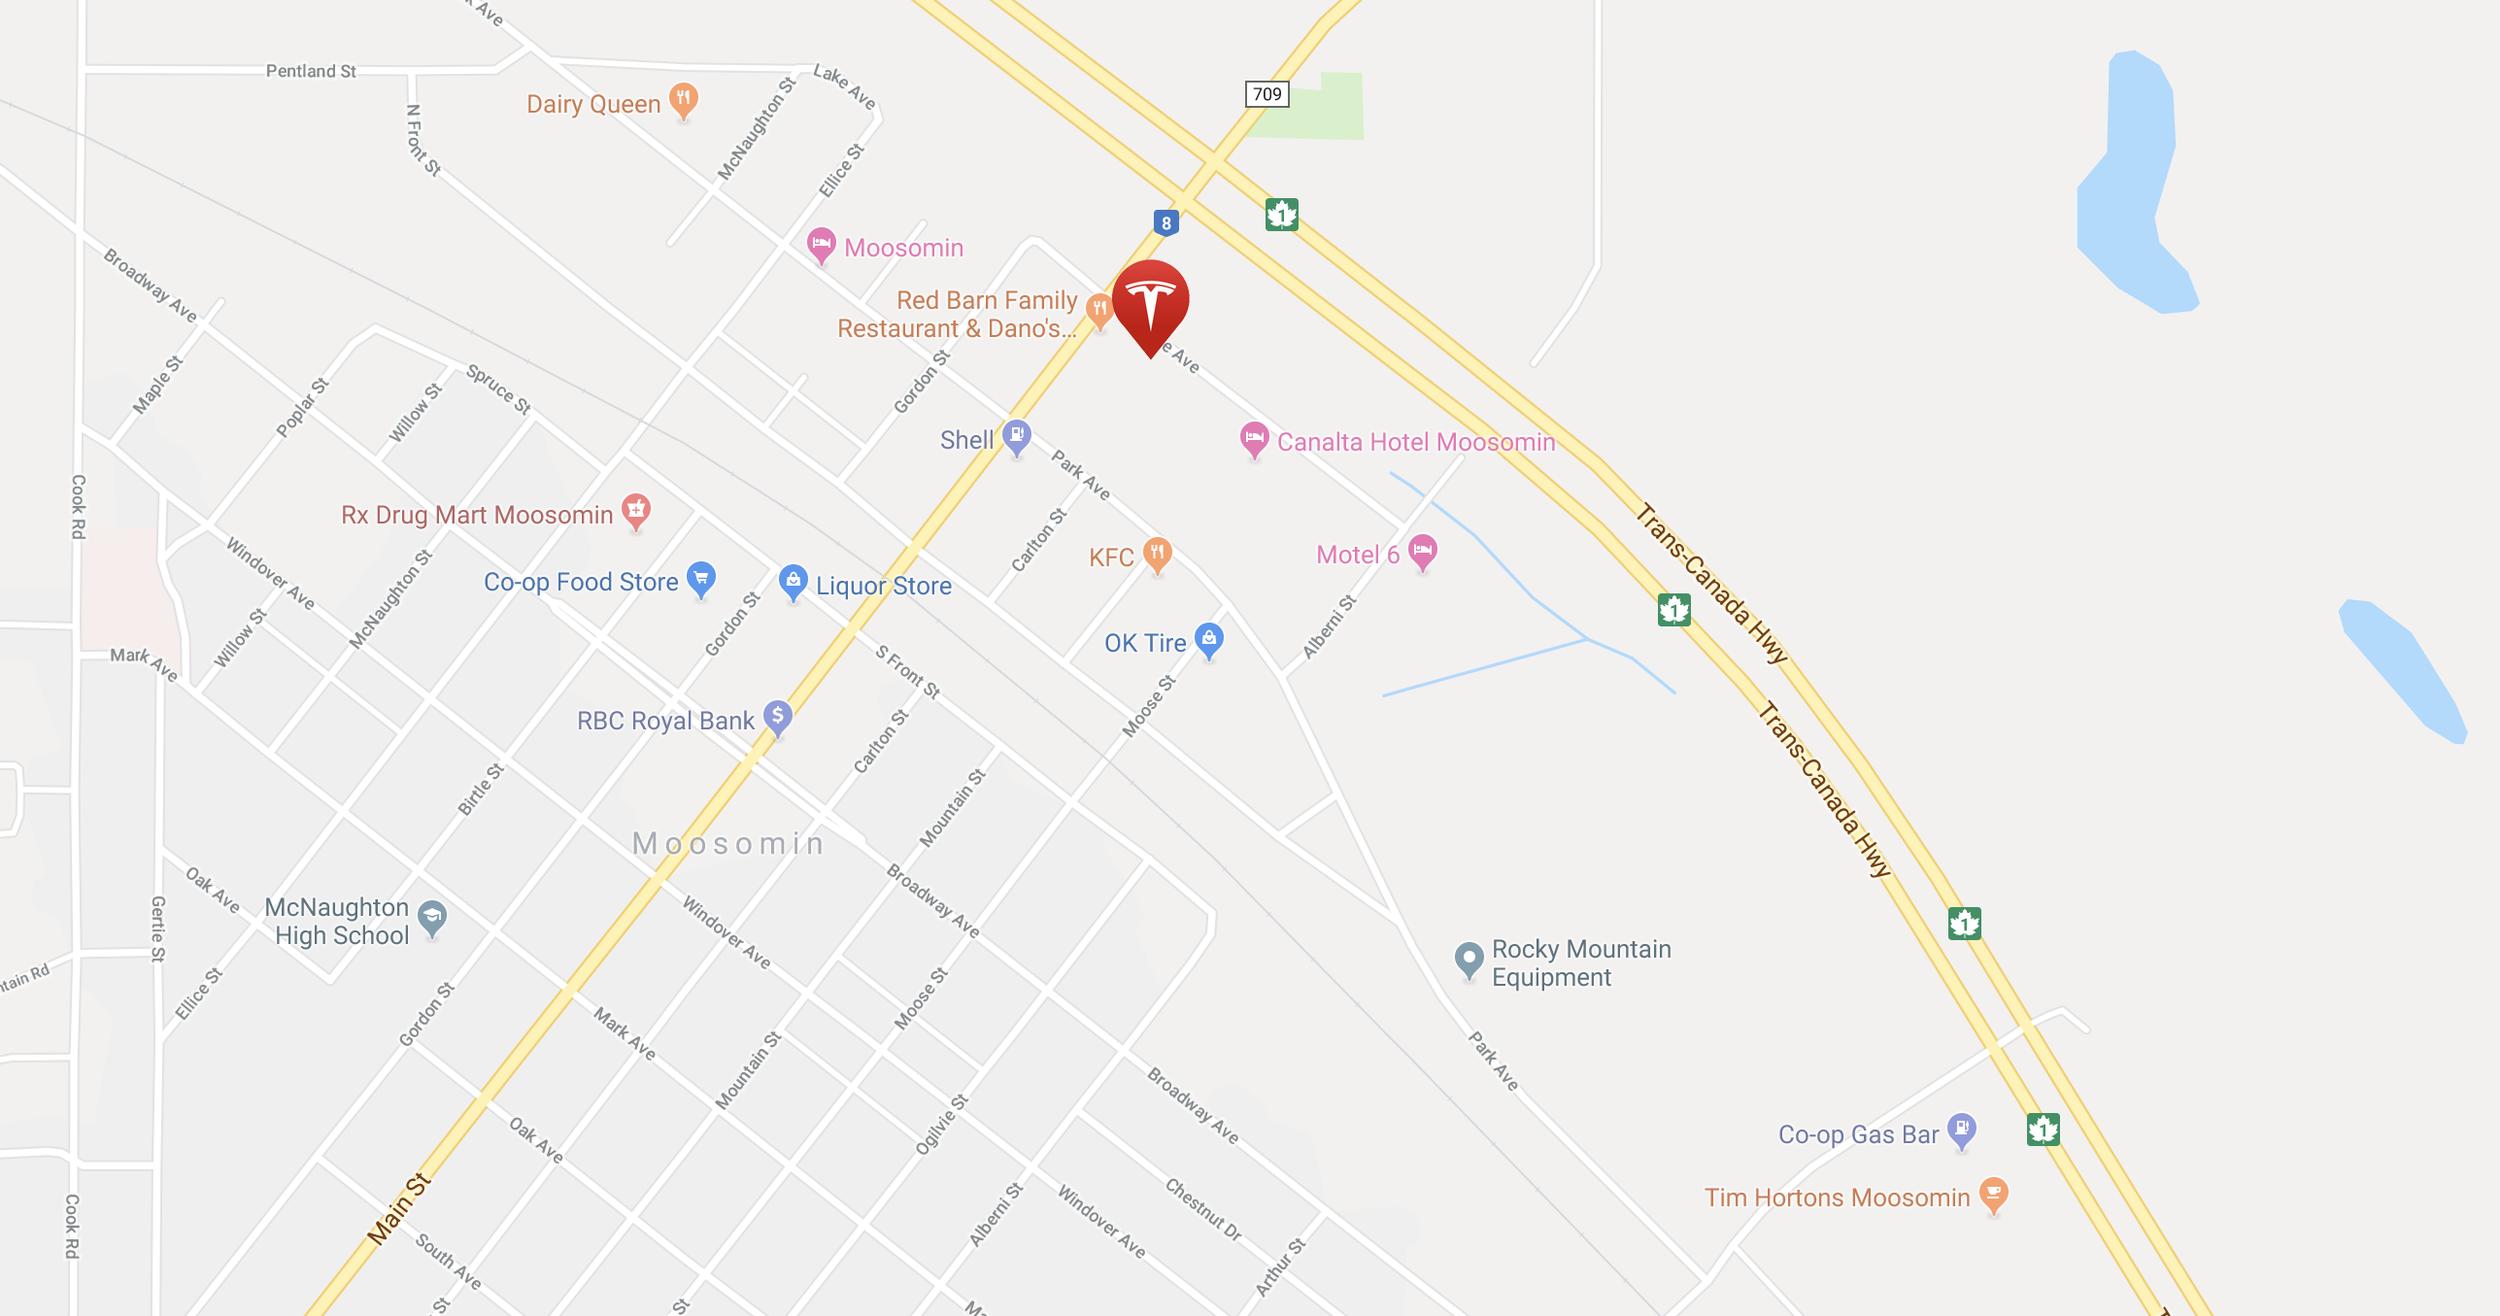 Supercharger Location in Moosomin, Saskatchewan